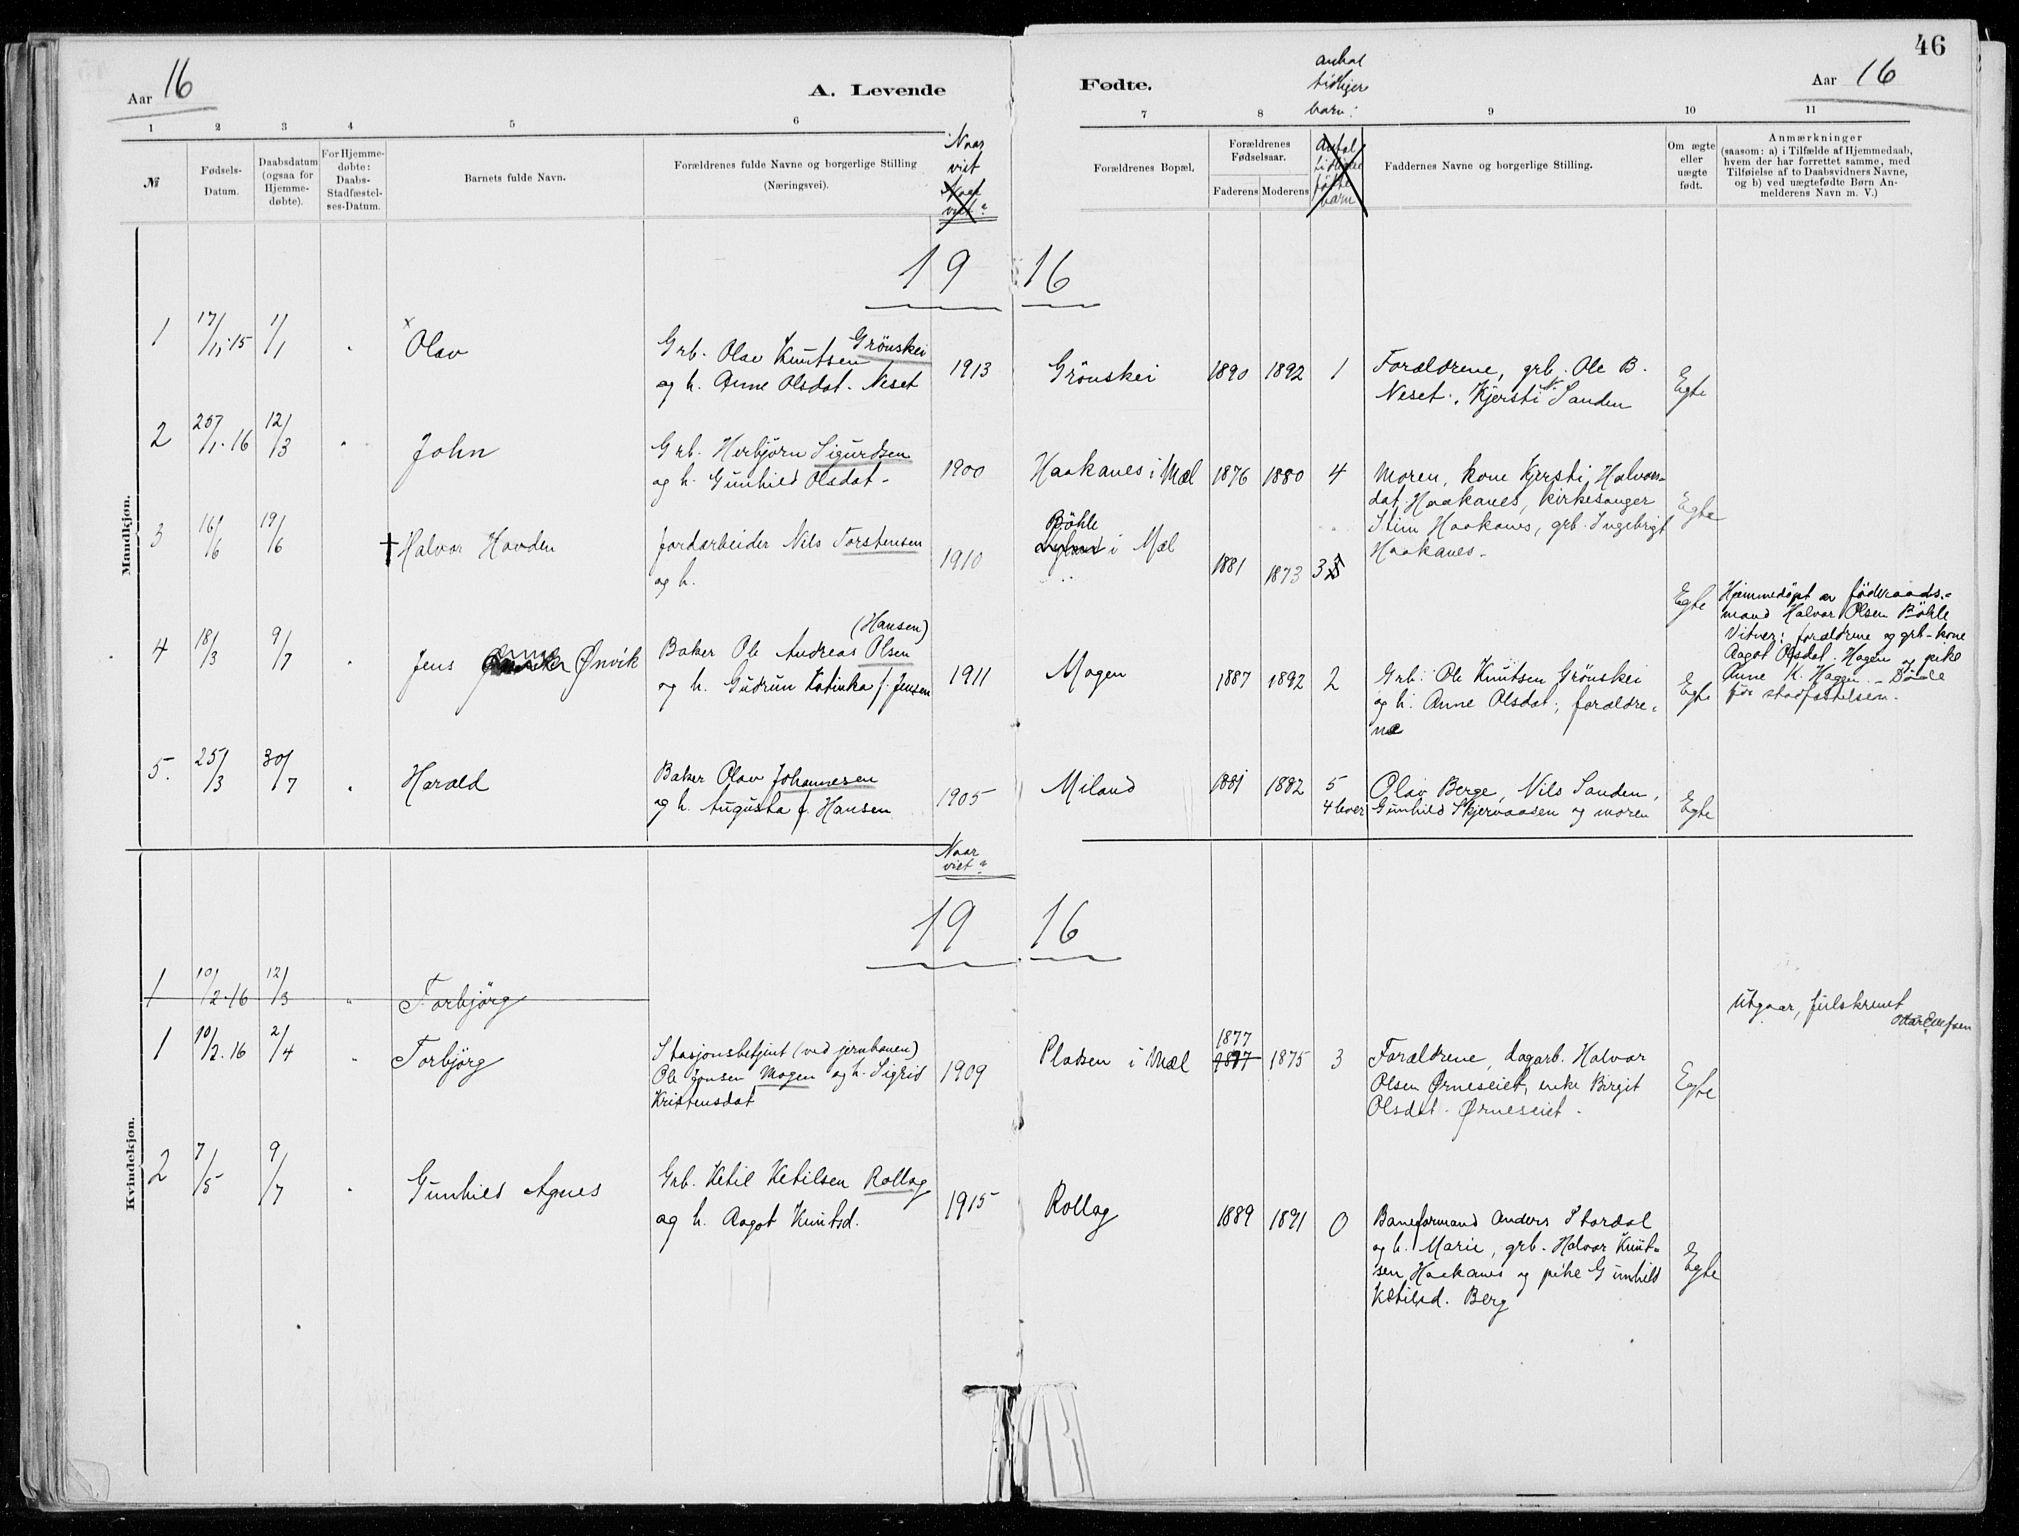 SAKO, Tinn kirkebøker, F/Fb/L0002: Ministerialbok nr. II 2, 1878-1917, s. 46